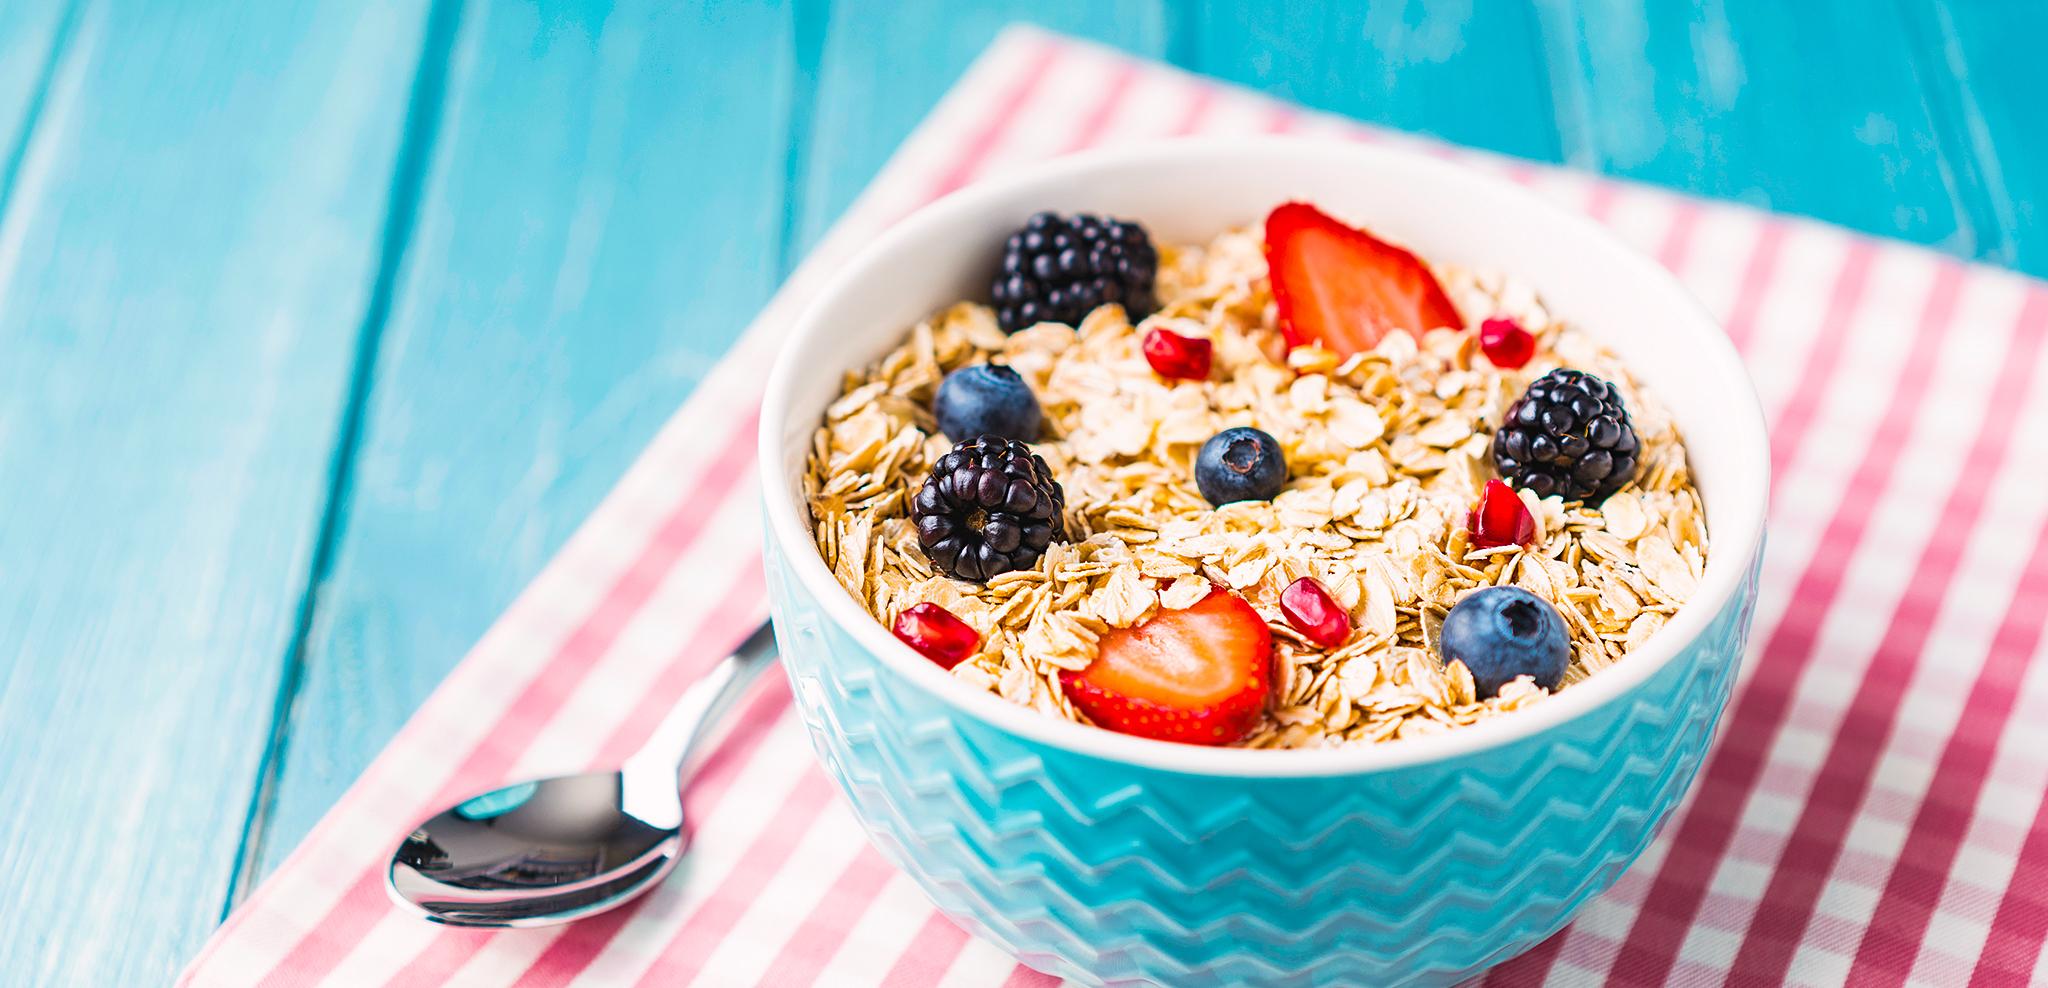 7 Nourishing Breakfast Options To Fight Inflammation